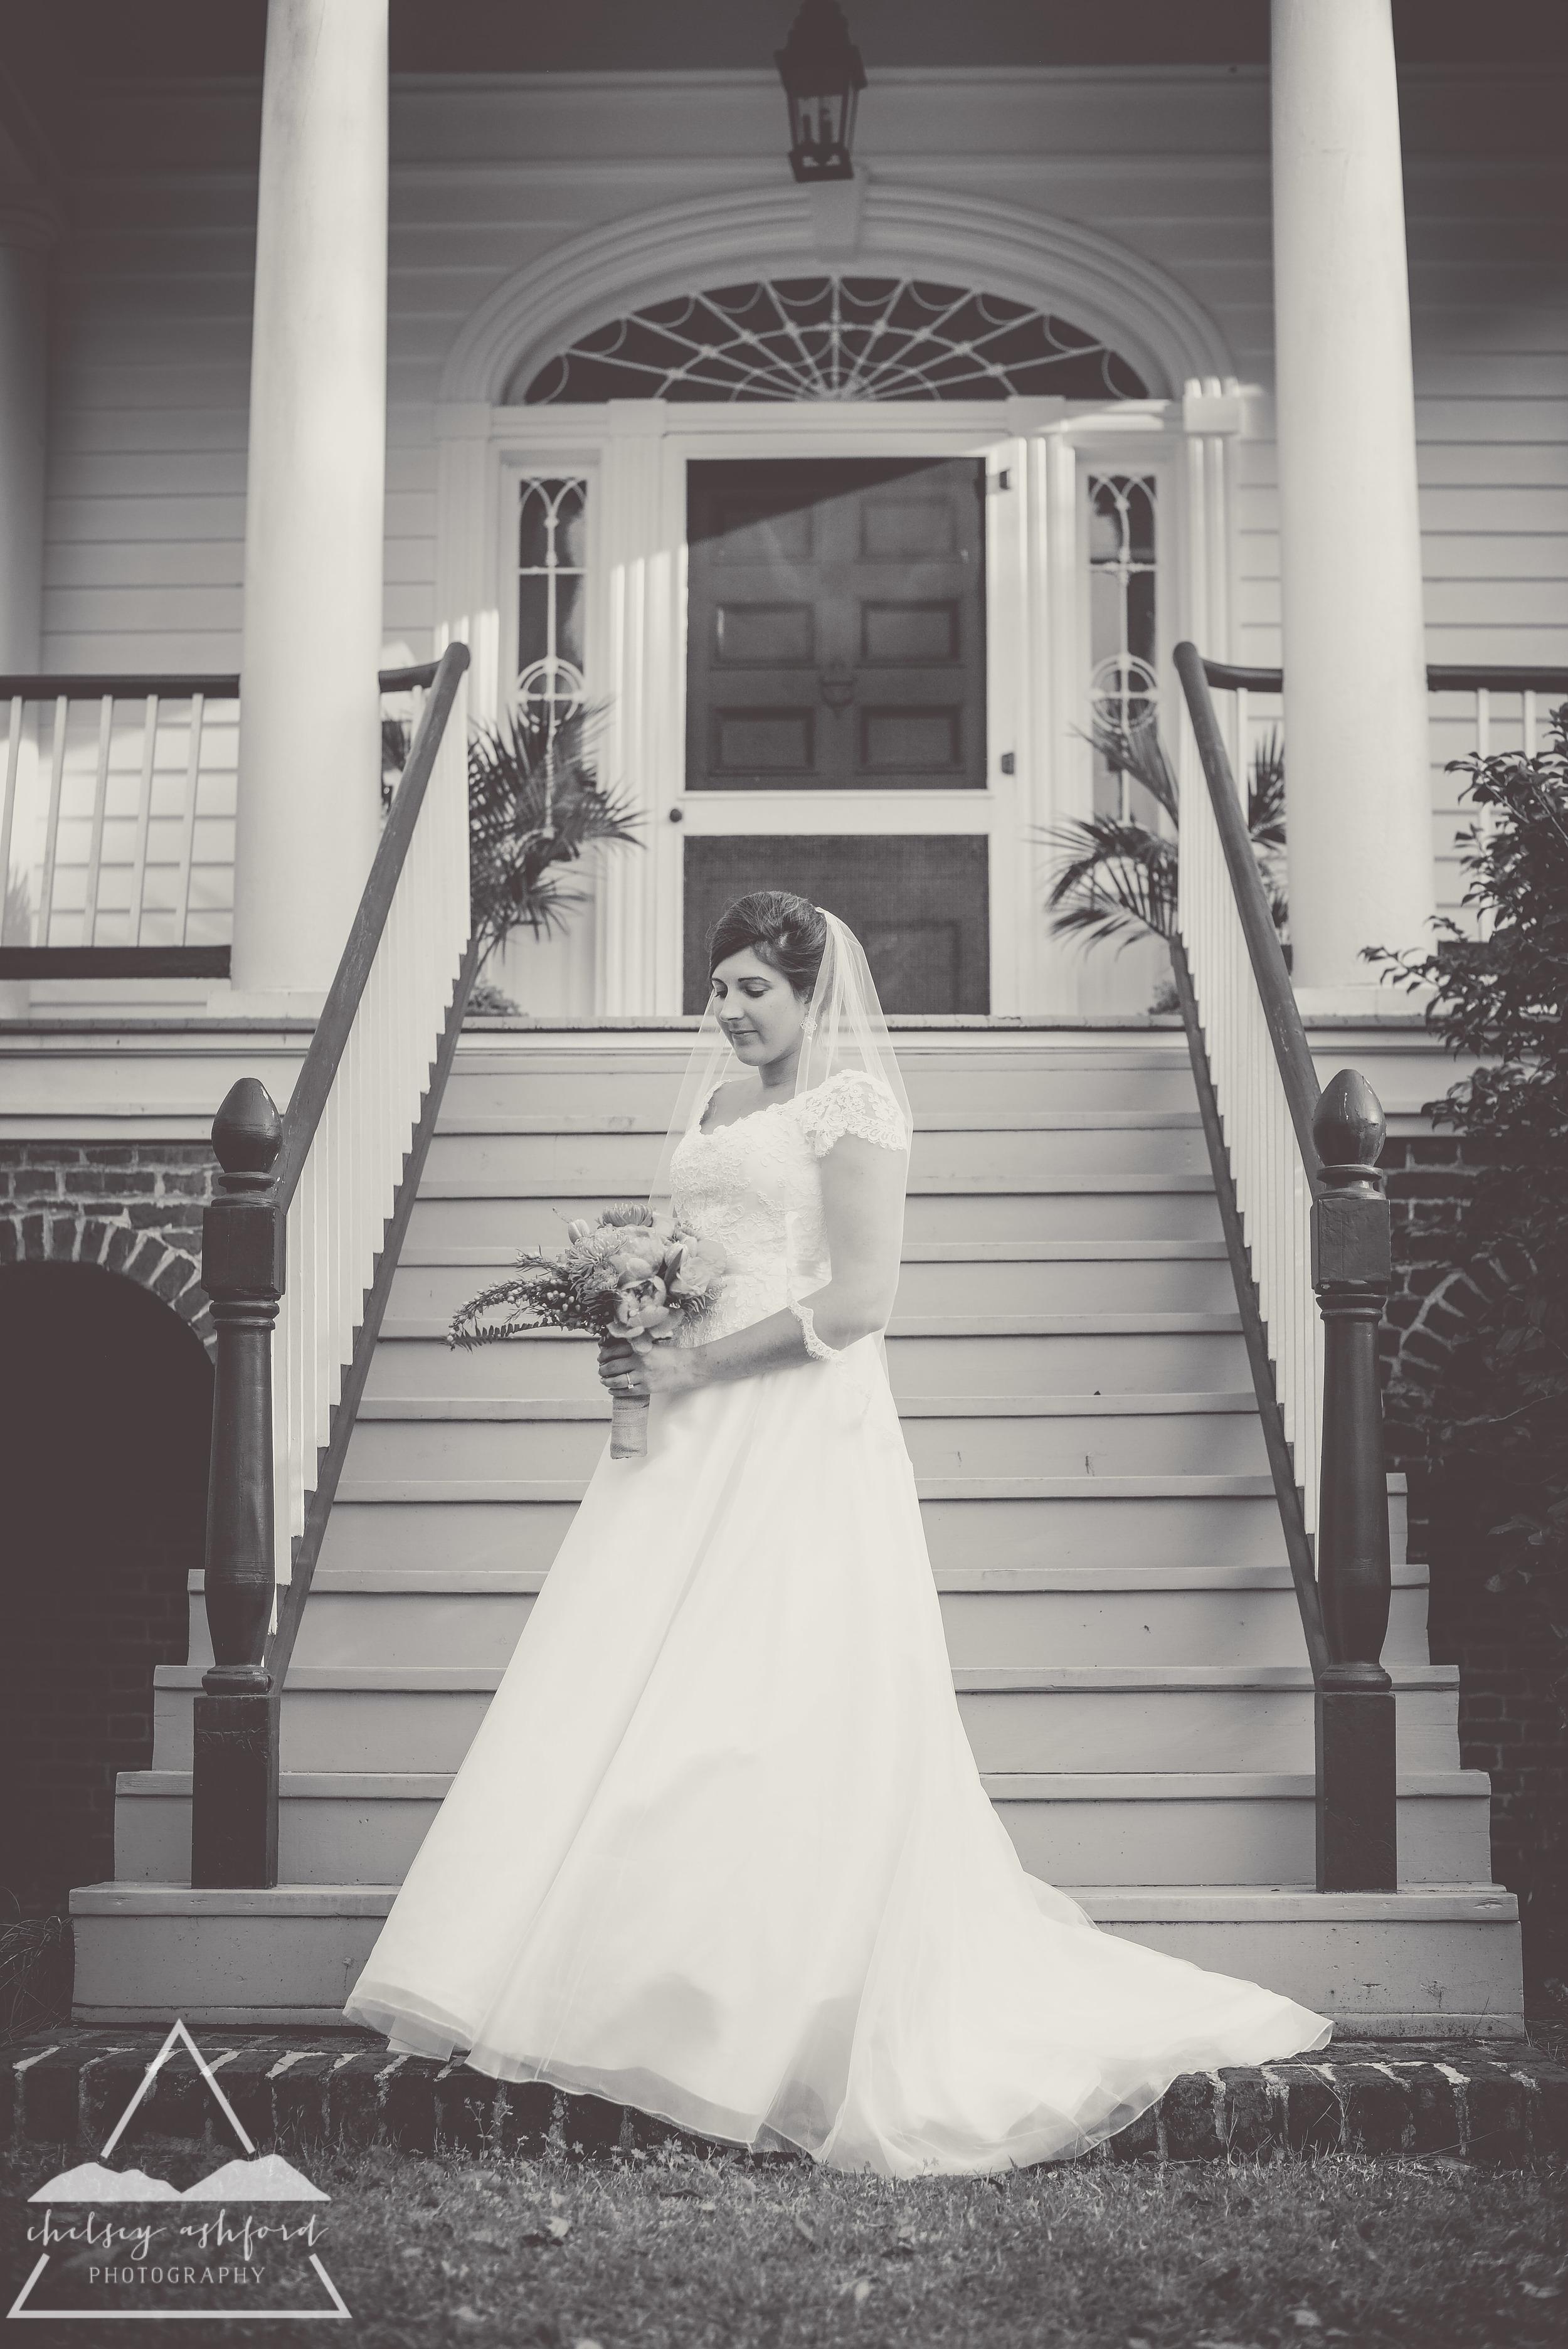 Sylvia_bridals_web-8.jpg